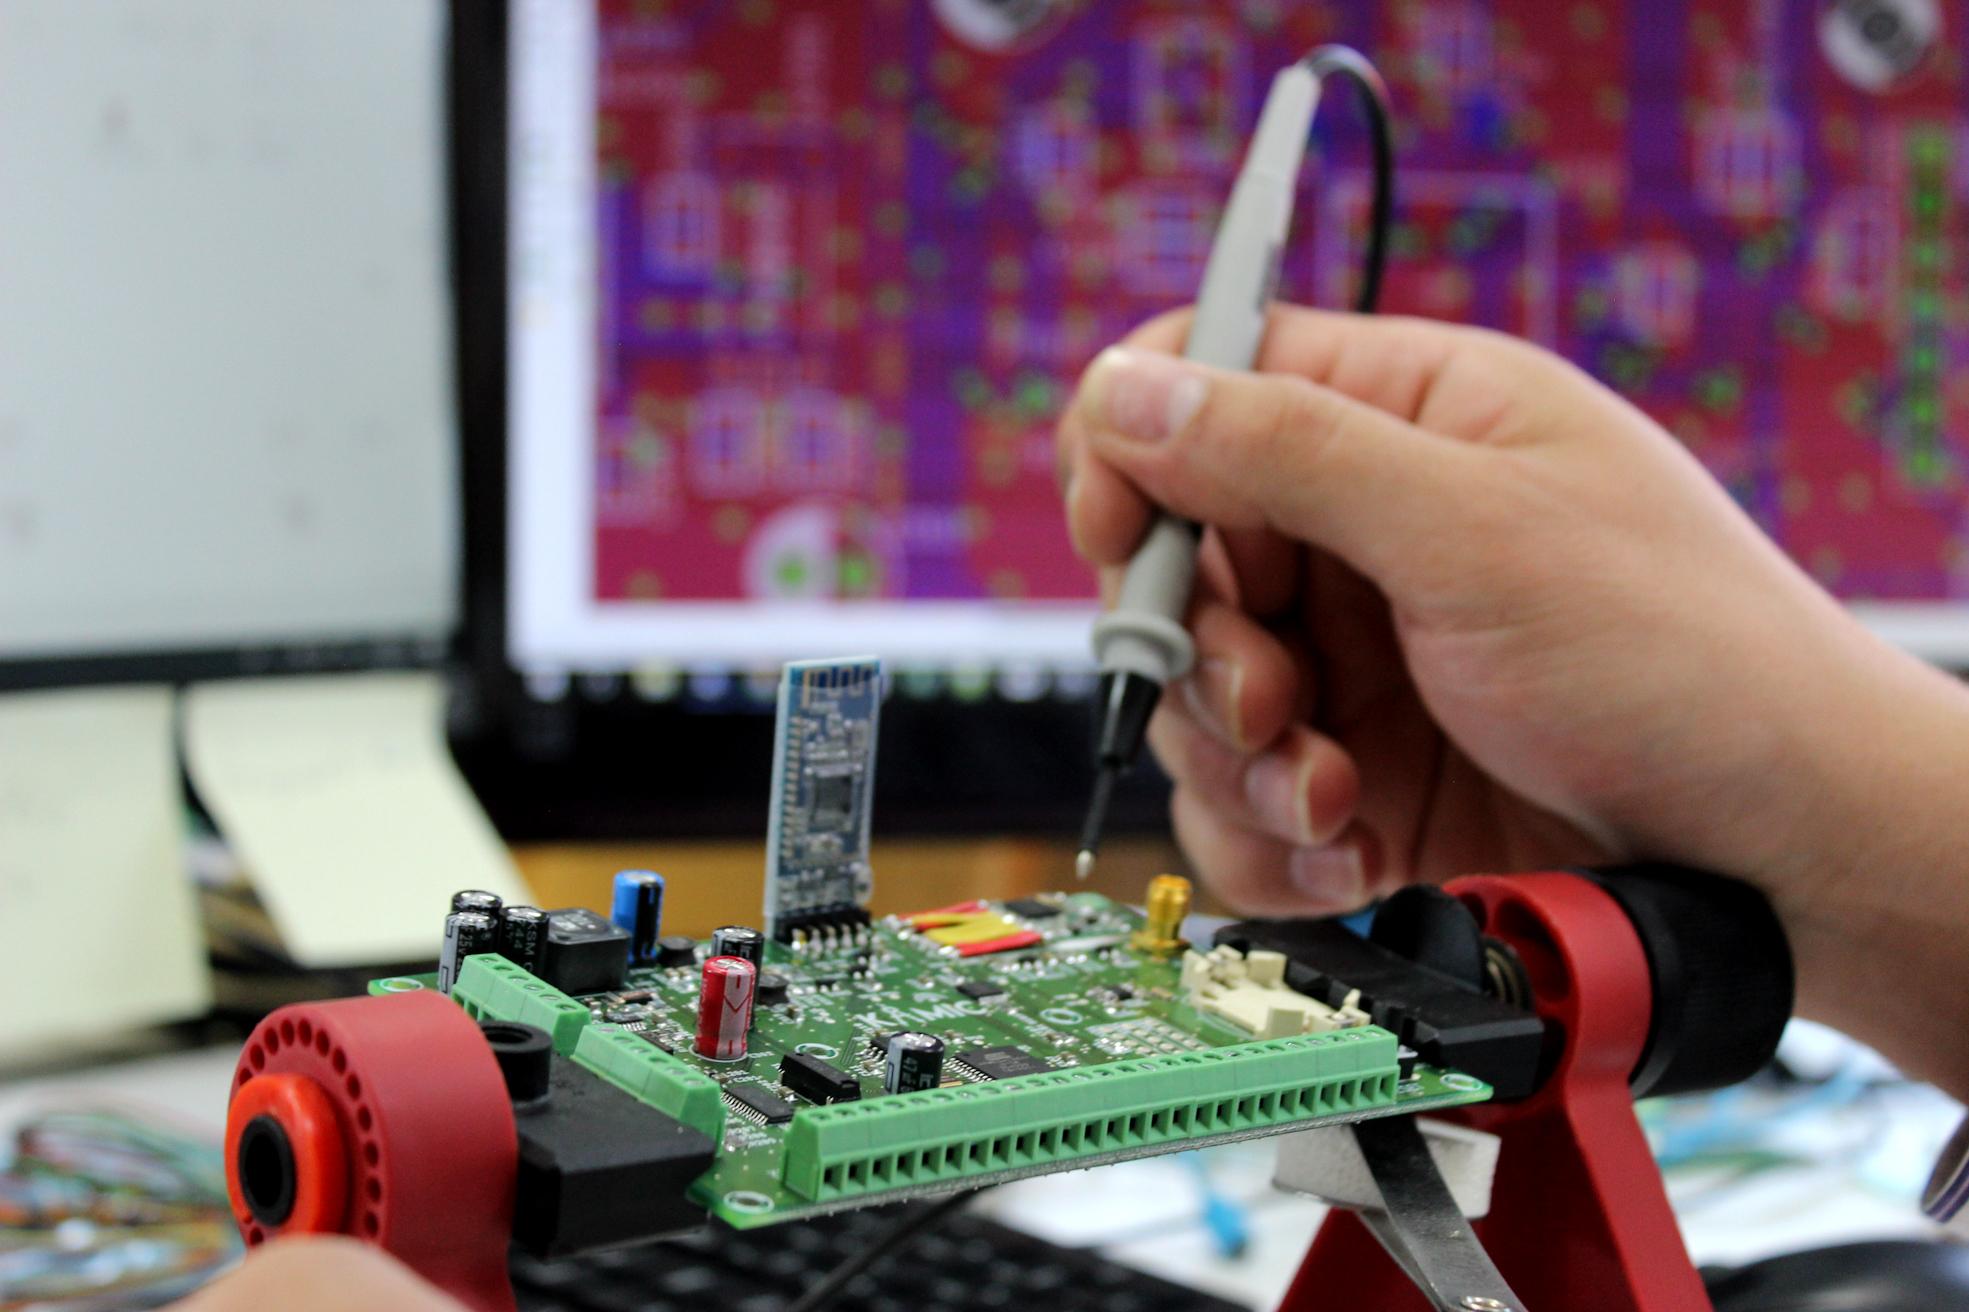 Circuíto para monitorizar infraestructuras. Desarrollo de producto, innovación, ingeniería, I+D+i.